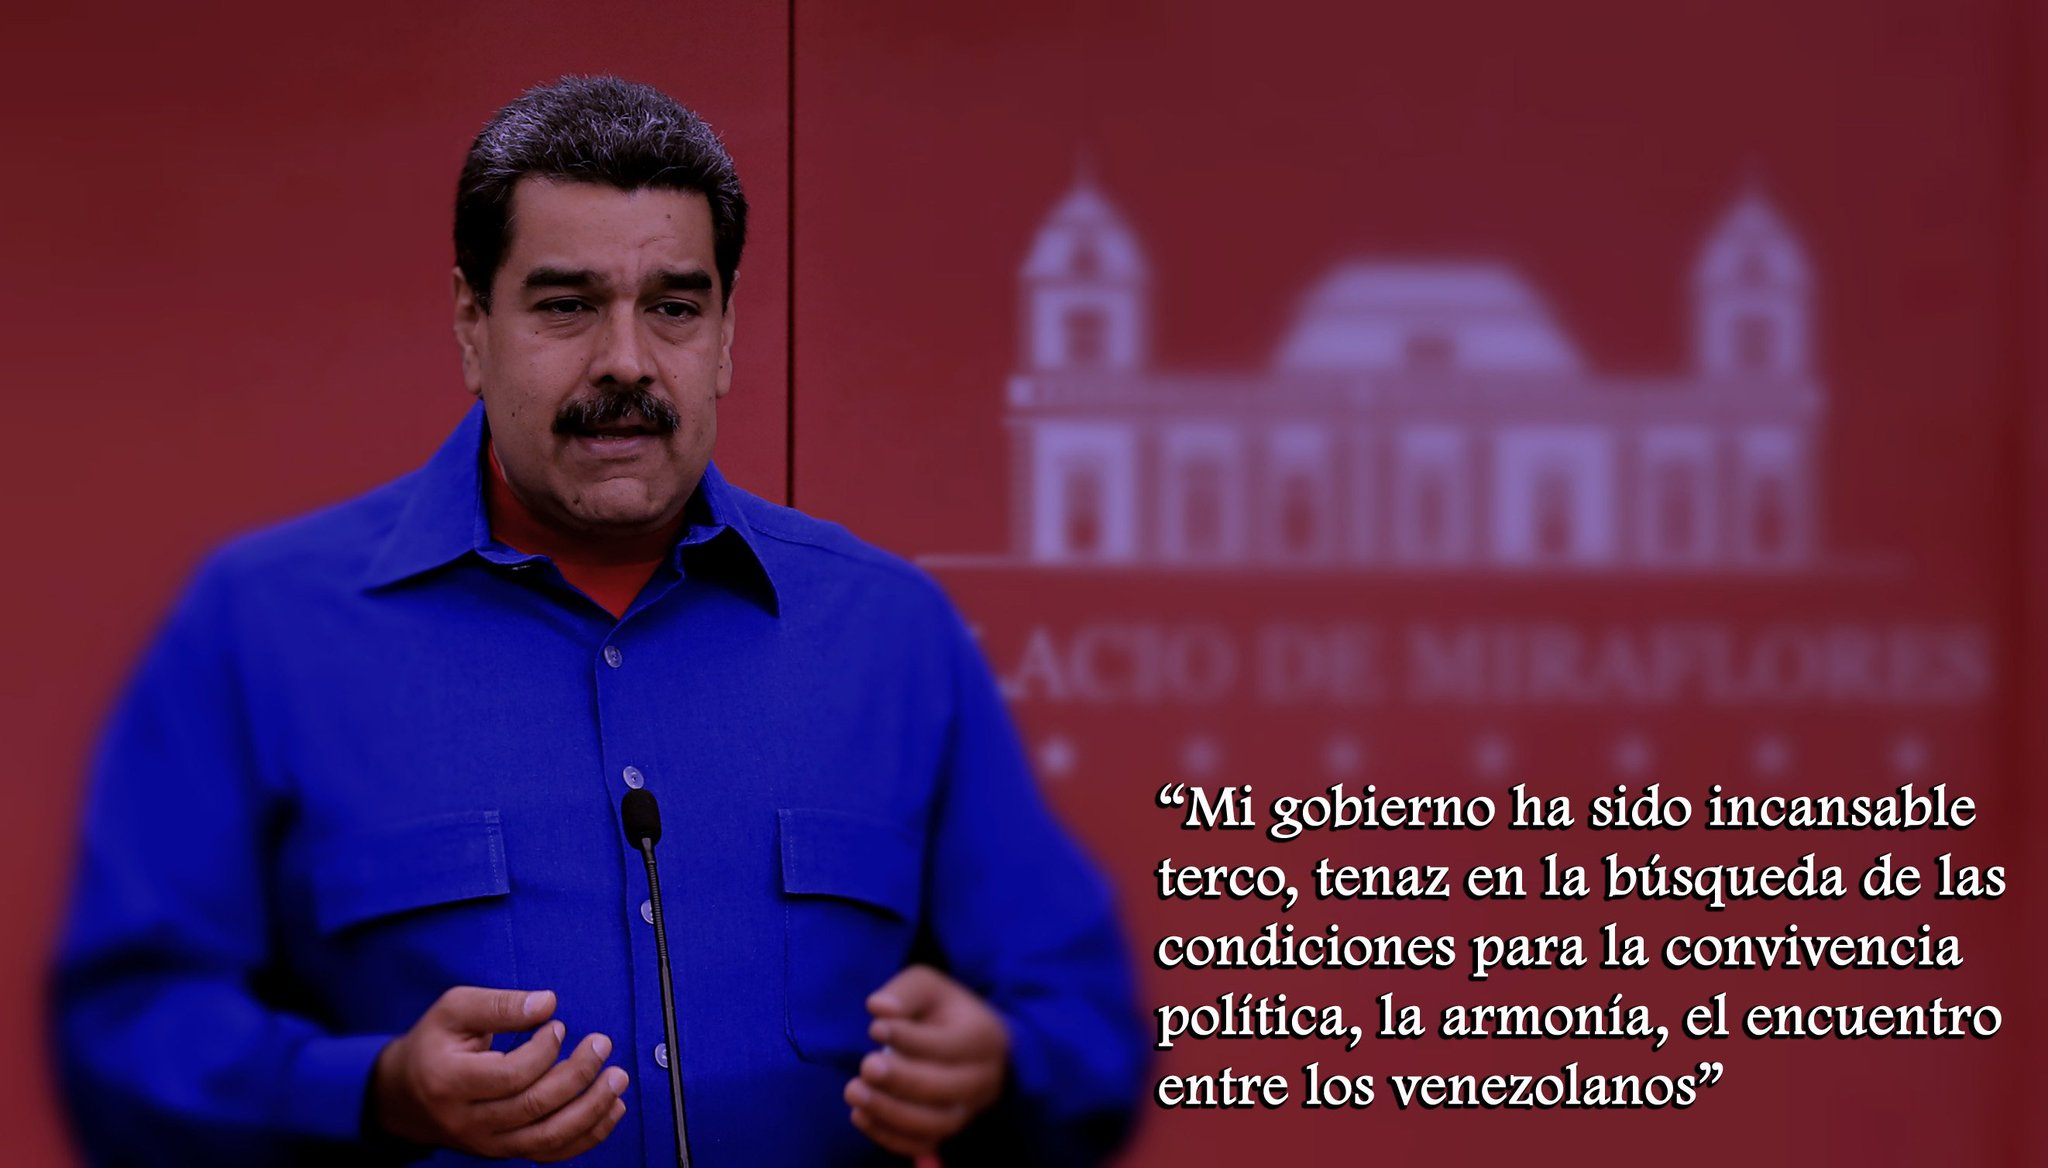 2018  6.- PALABRAS del PRESIDENTE @NicolasMaduro al pueblo venezolano https://t.co/tcidRldyis